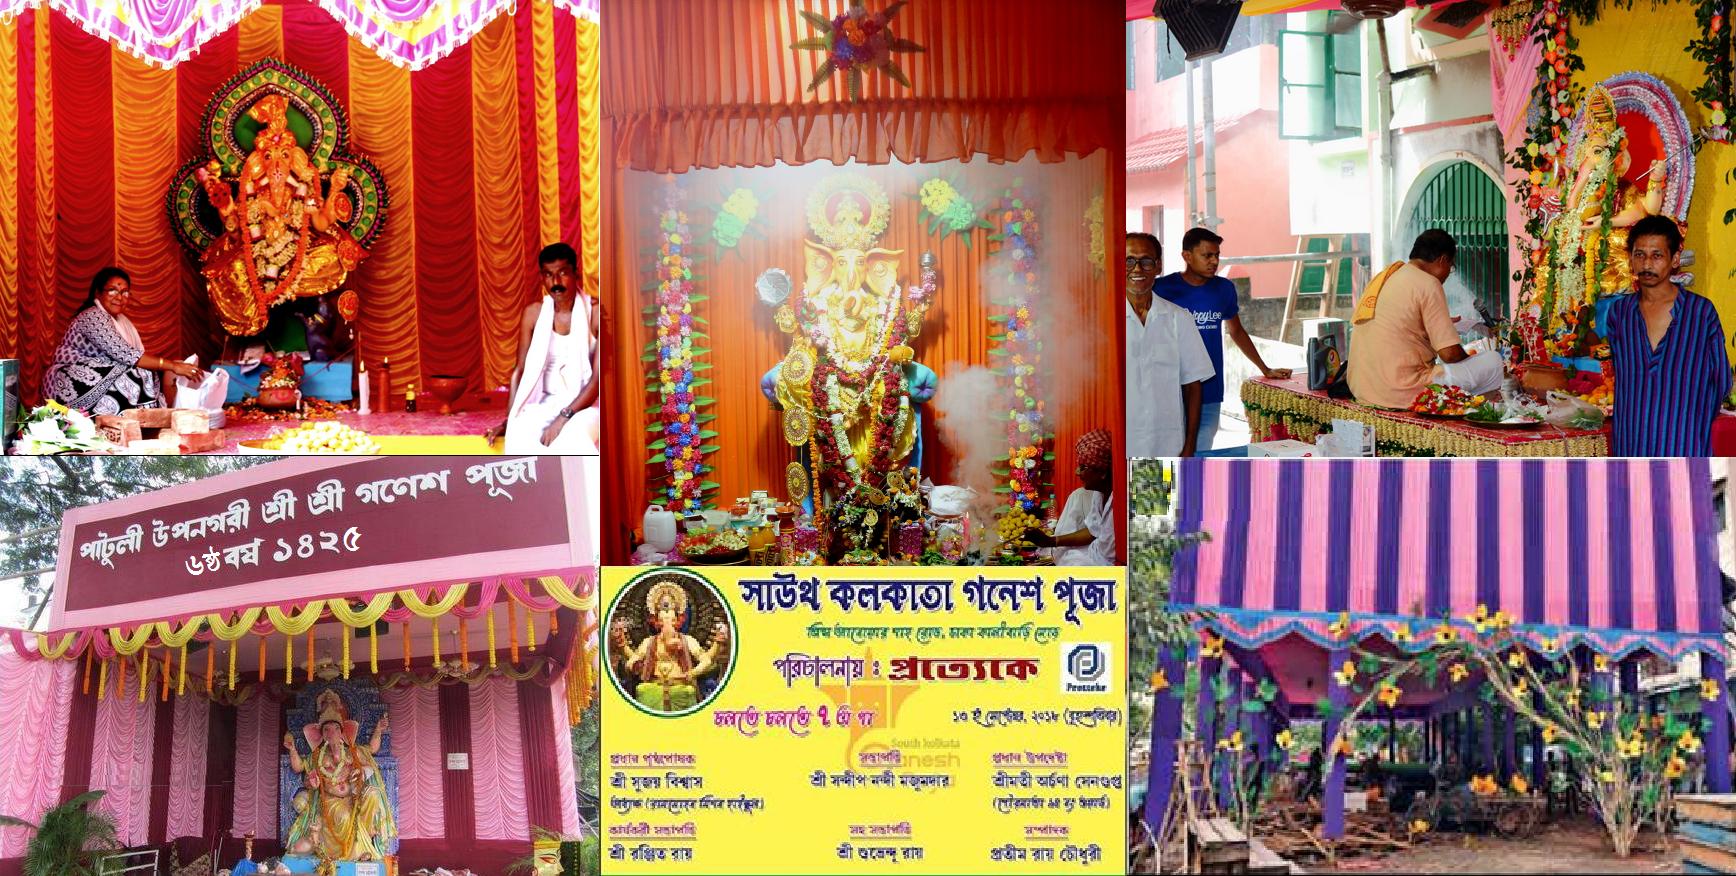 Kolkata revels in Ganesh Chaturthi spiritu2026 Ganesh